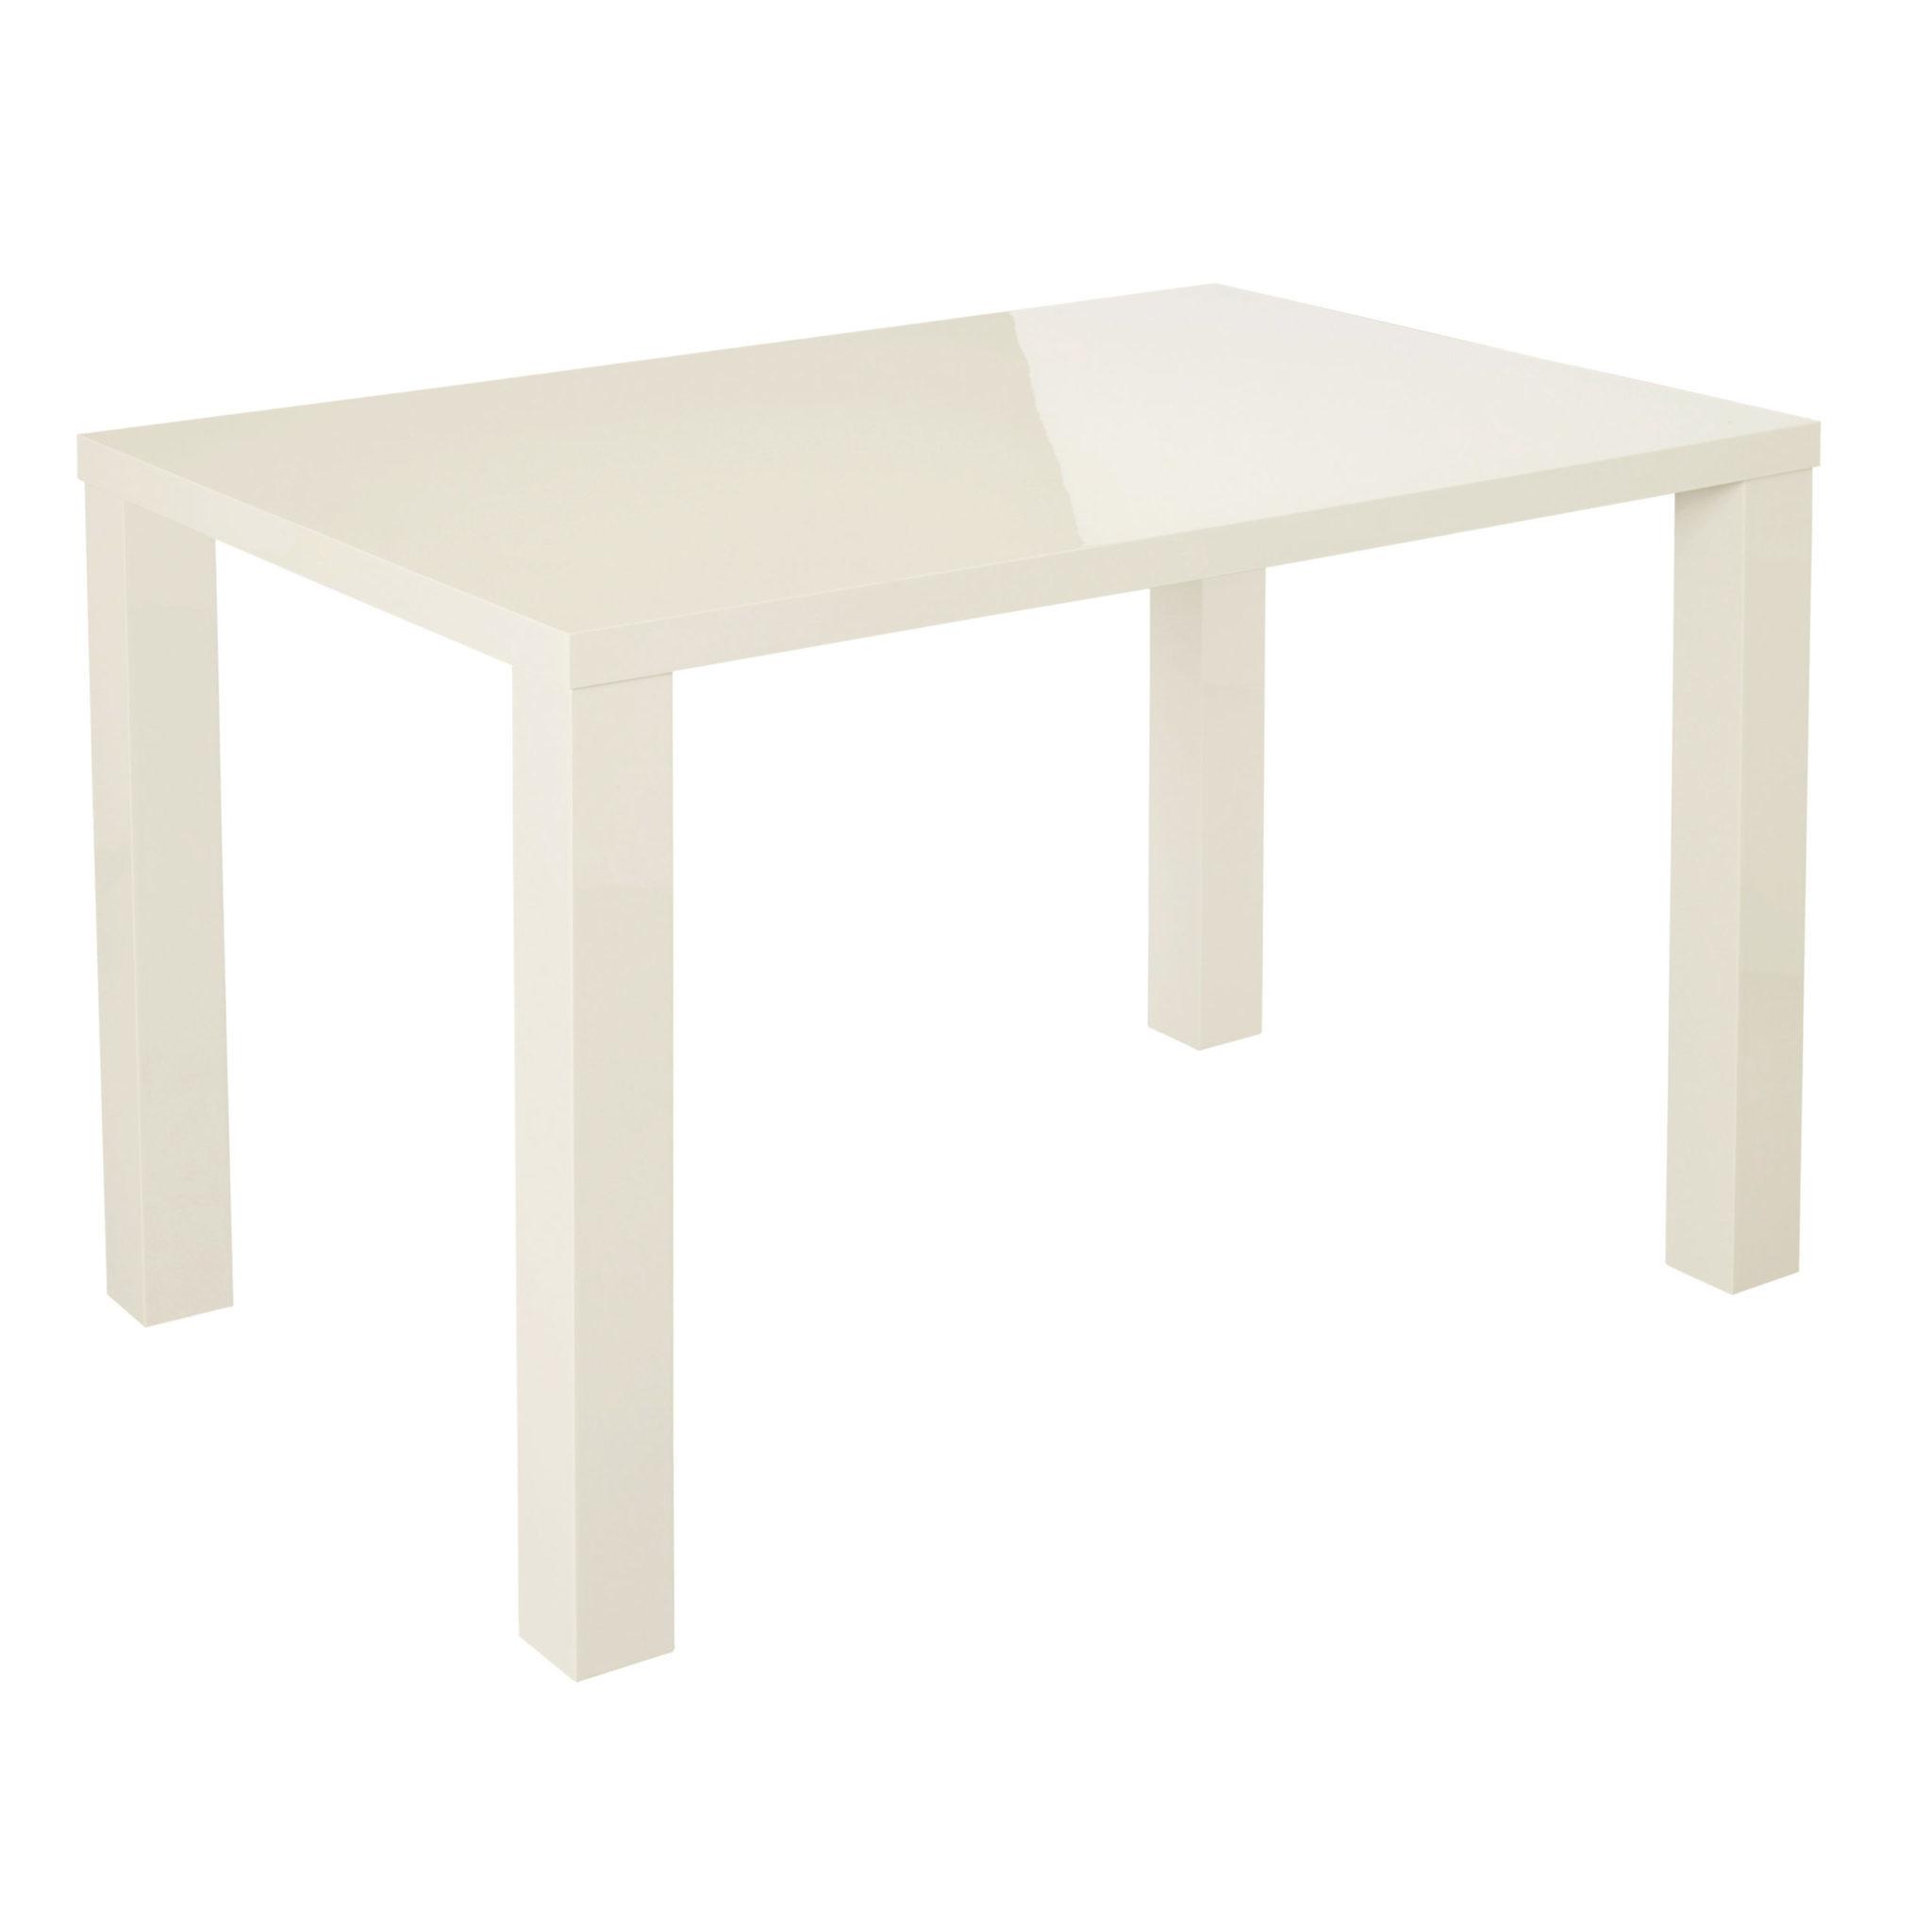 Manny Medium Dining Table Cream